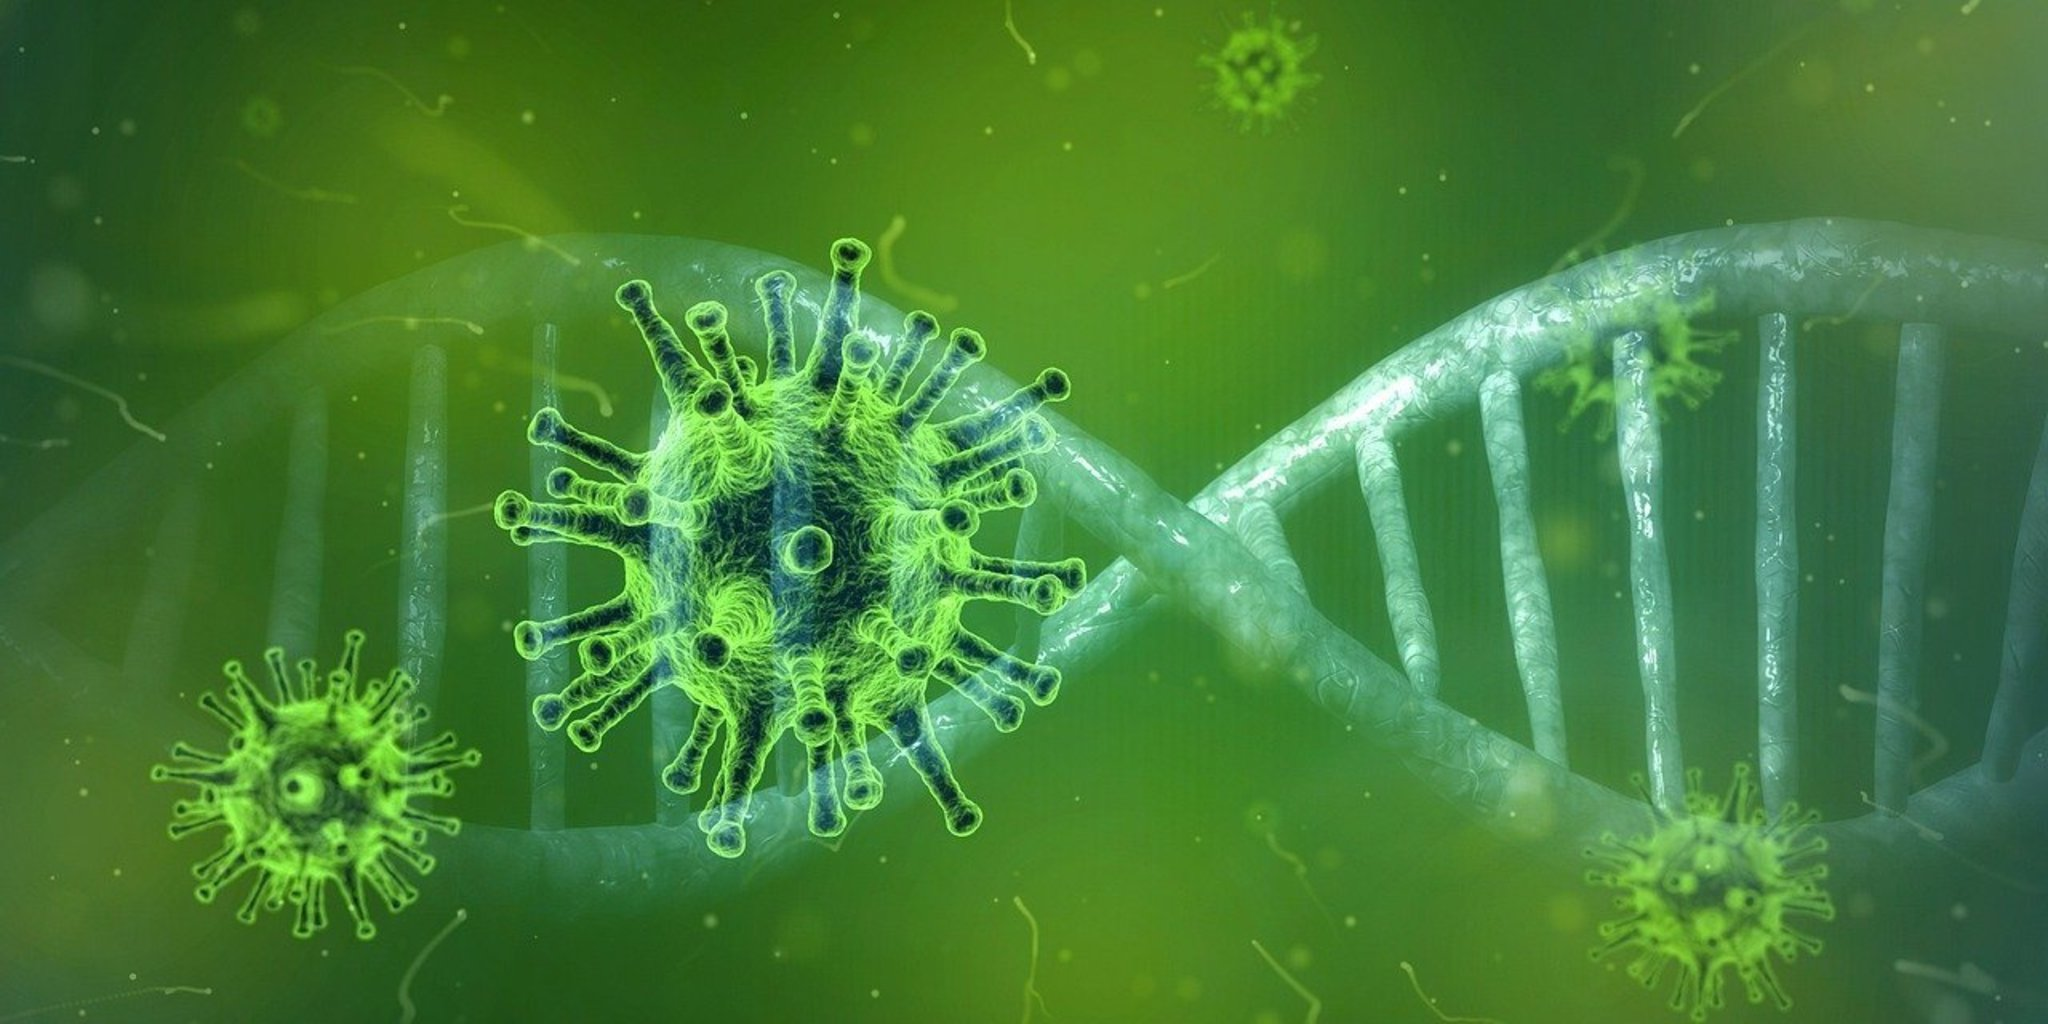 روکیدا | ویروس ها چگونه عمل می کنند؟ | علایم کرونا ویروس, ویروس کرونا, کروناویروس